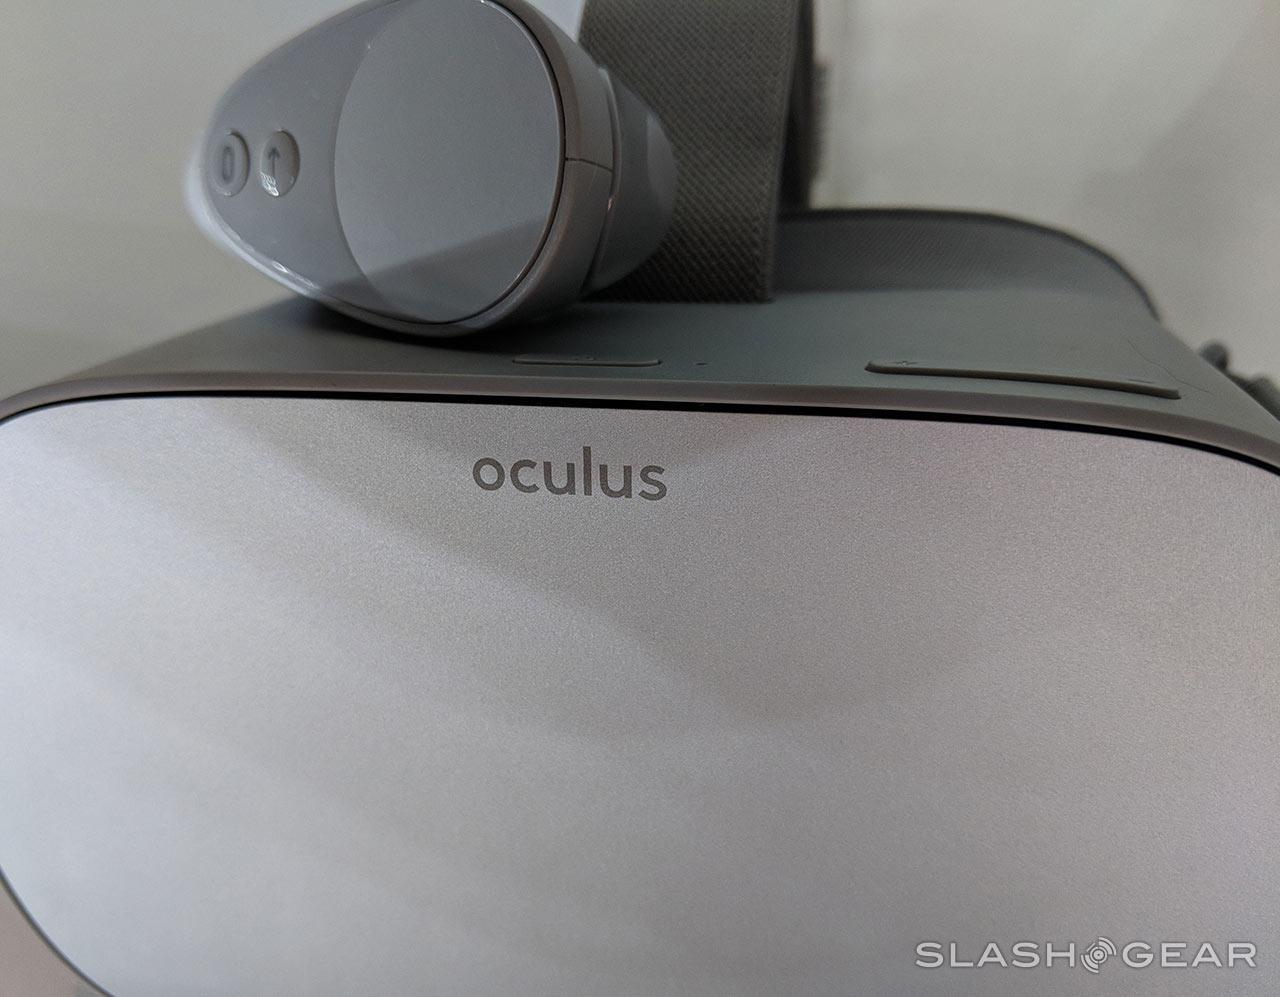 Oculus Go Review: So Simple, So Great - SlashGear